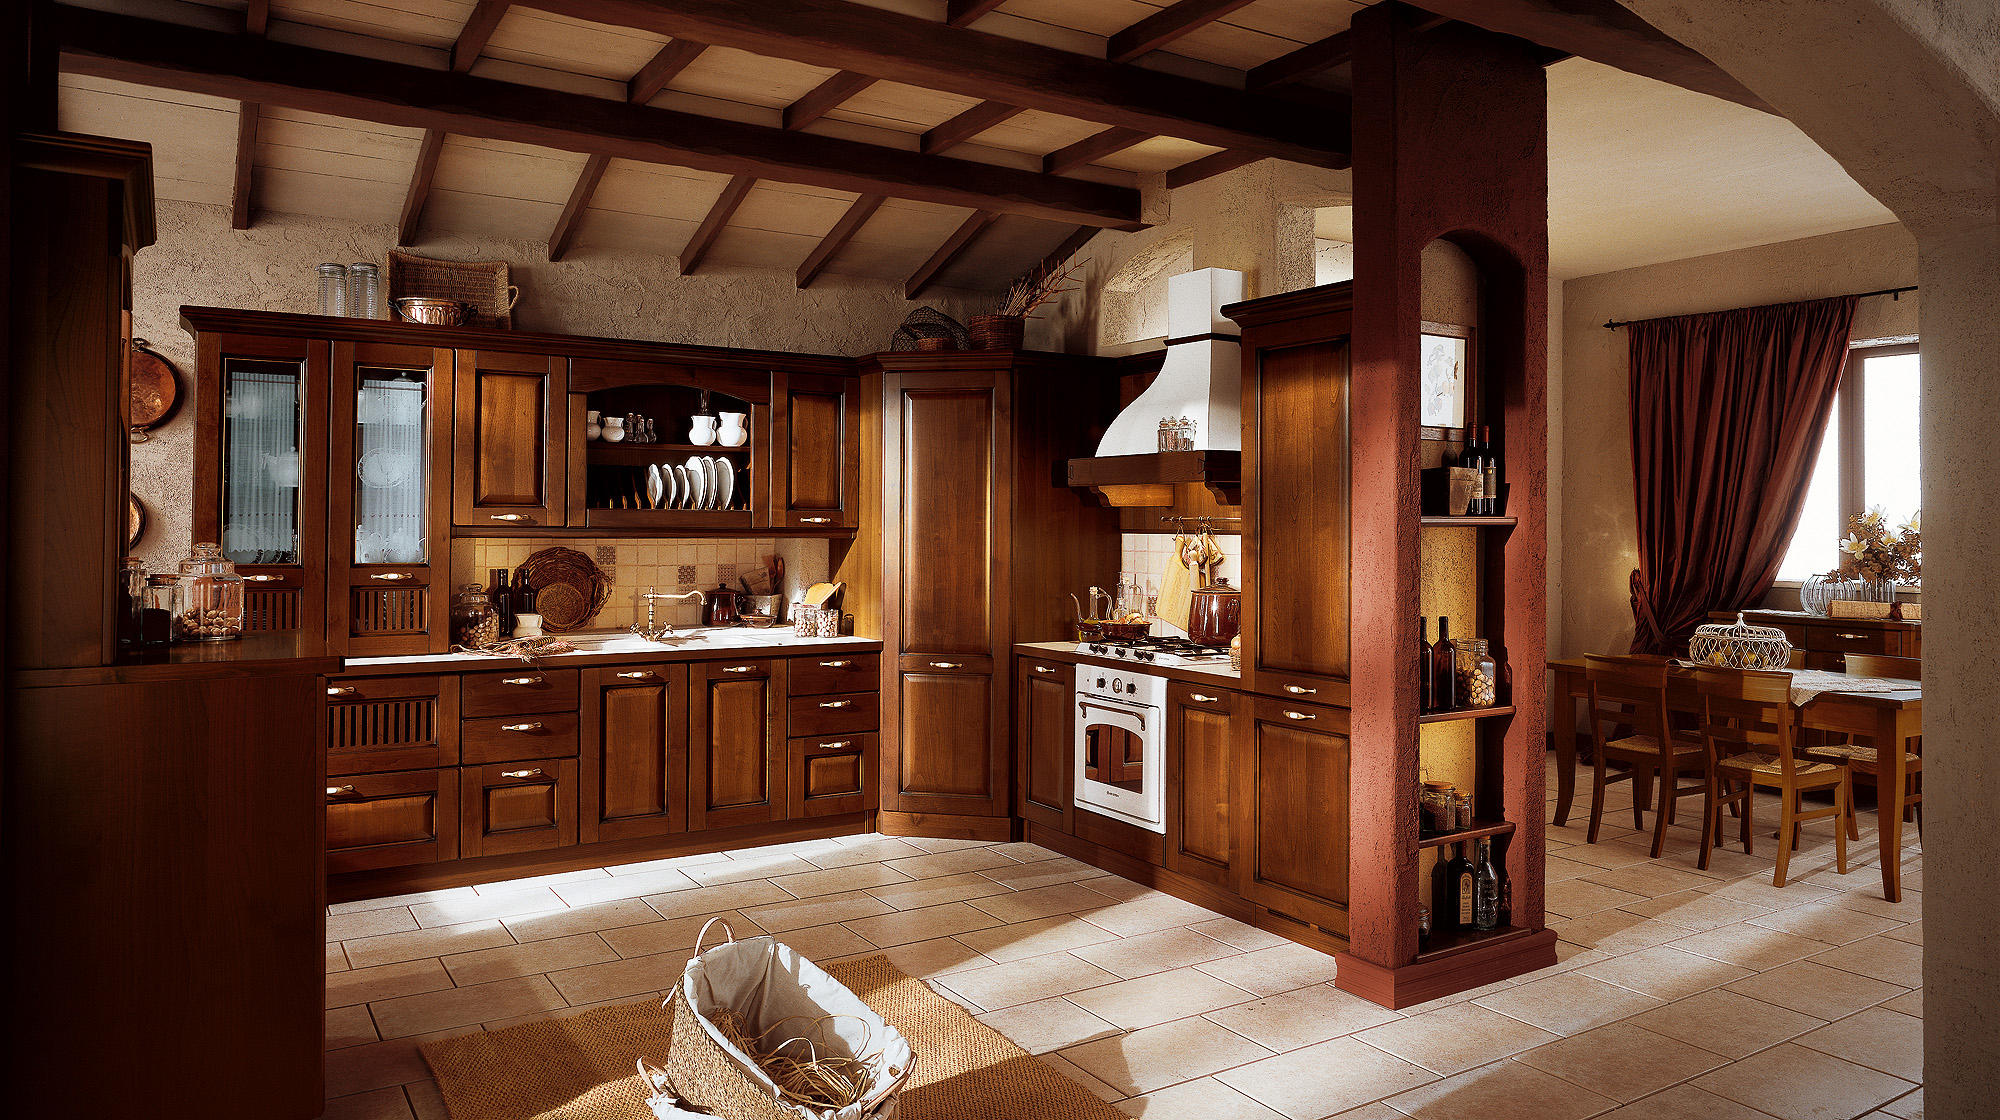 Verdiana cucine a parete veneta cucine architonic for Arredamento rustico elegante